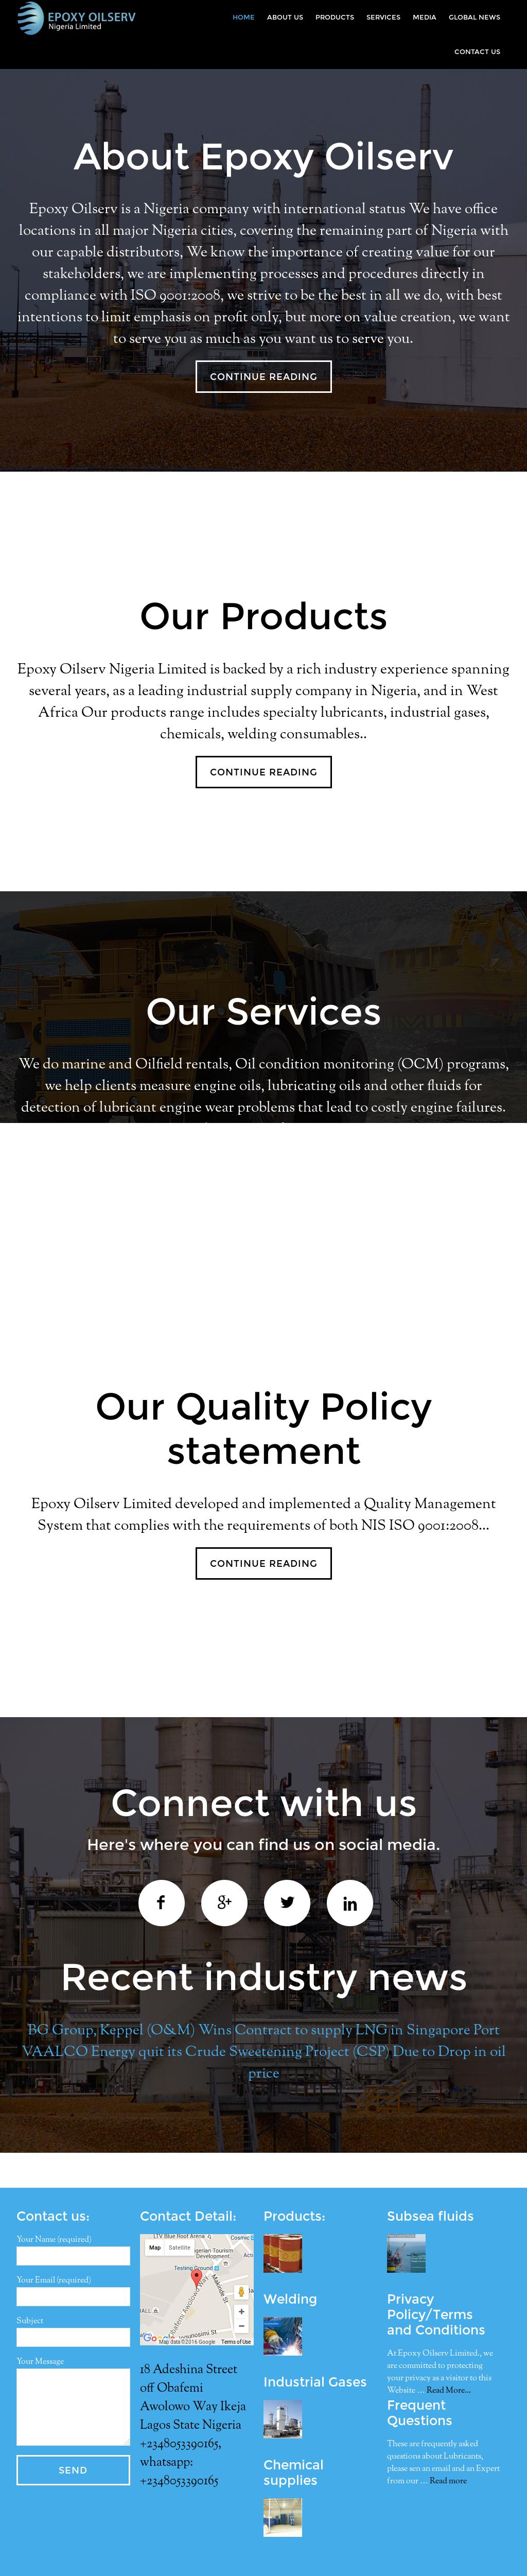 Epoxy Oilserv Competitors, Revenue and Employees - Owler